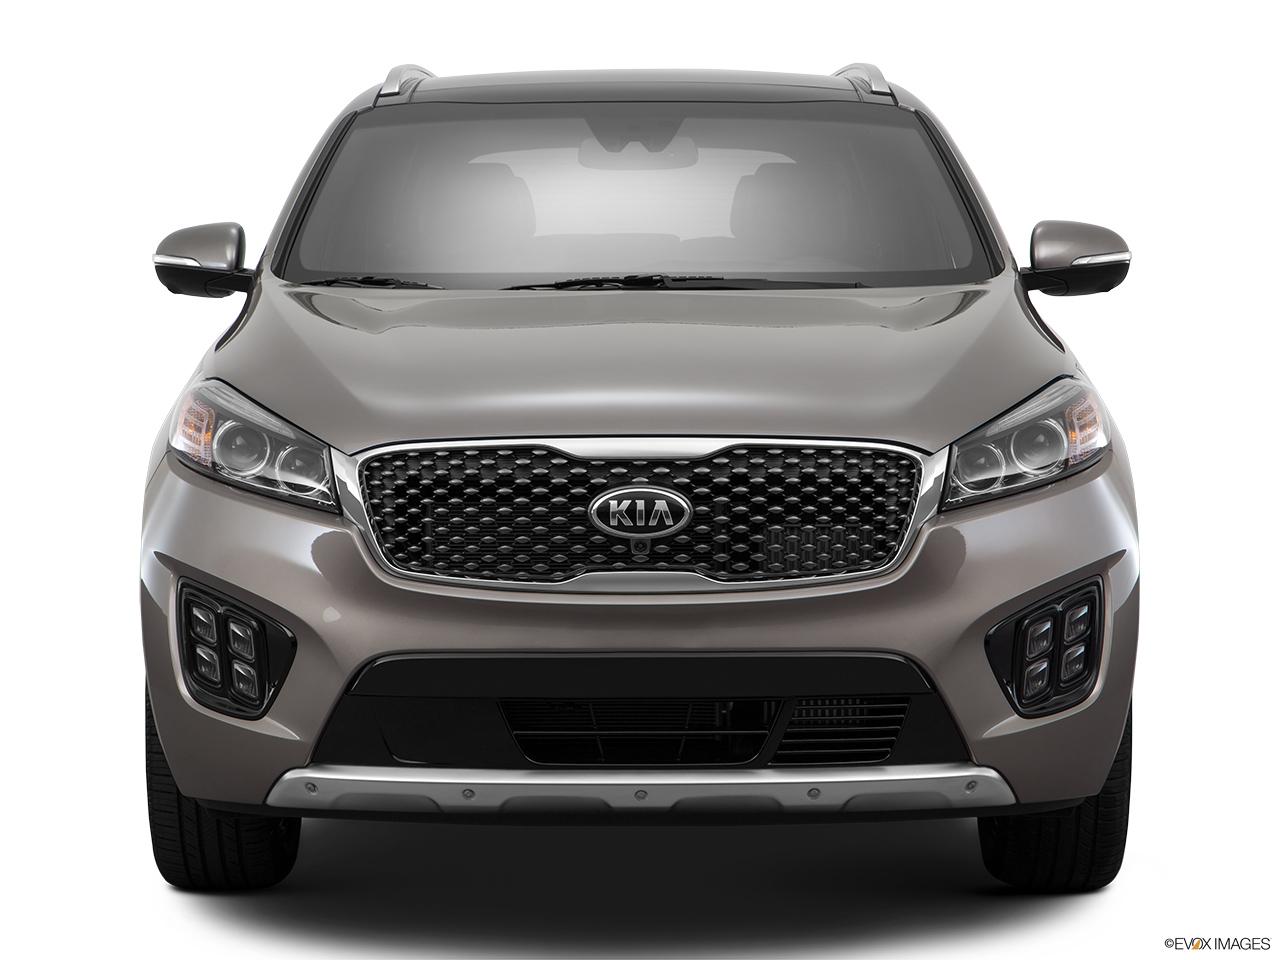 Car Pictures List For Kia Sorento 2017 3 3l Top Awd Qatar Yallamotor